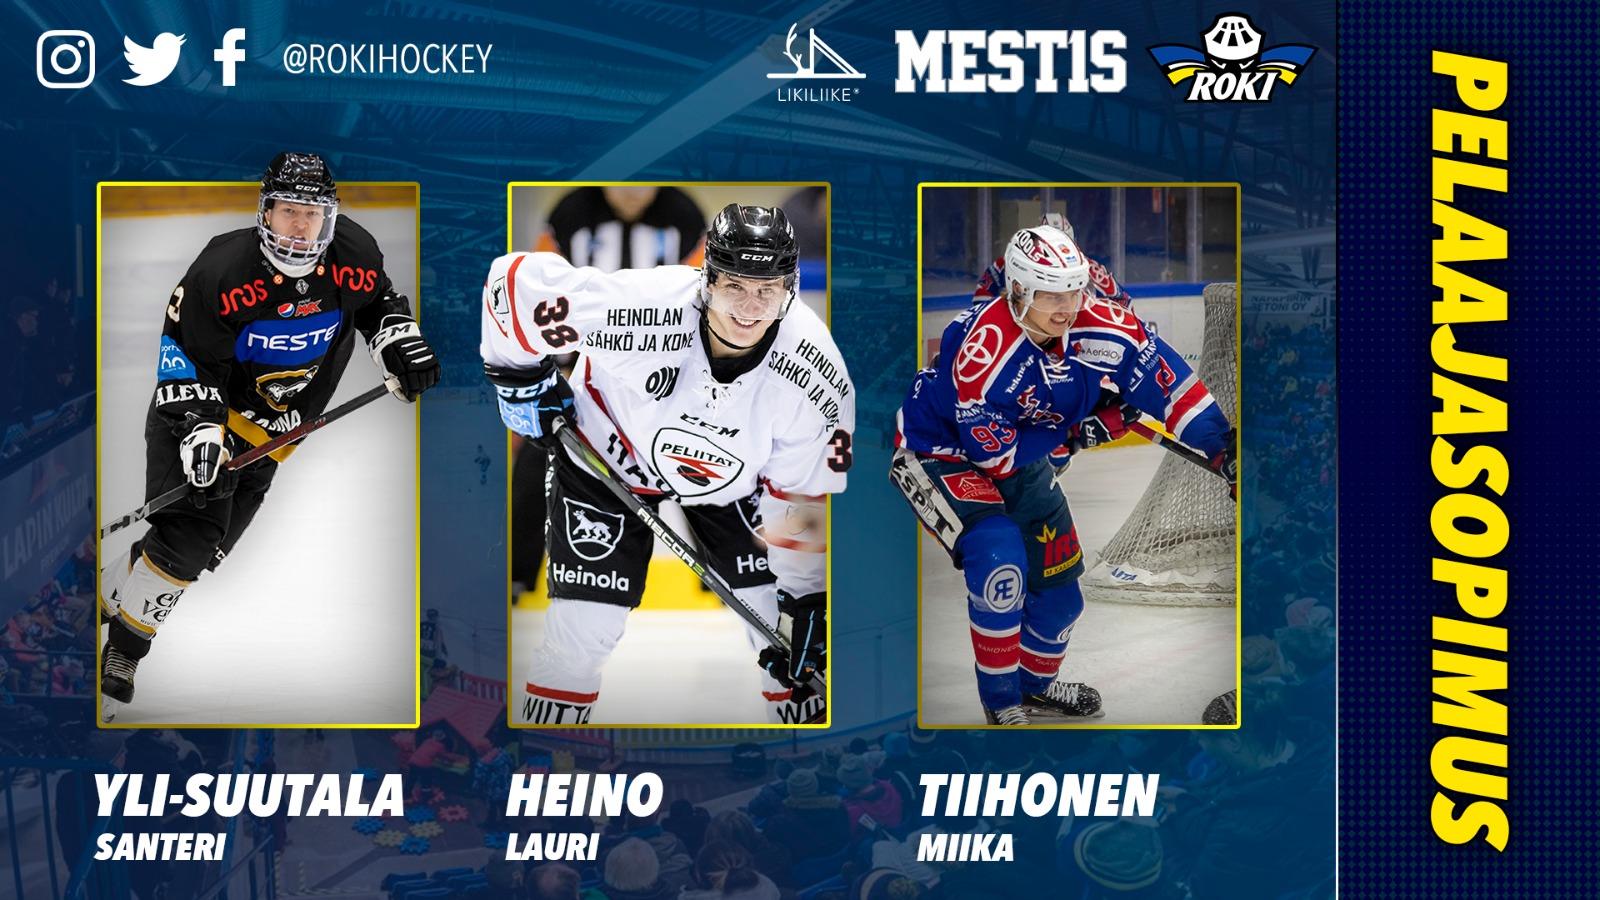 rokihockey.fi